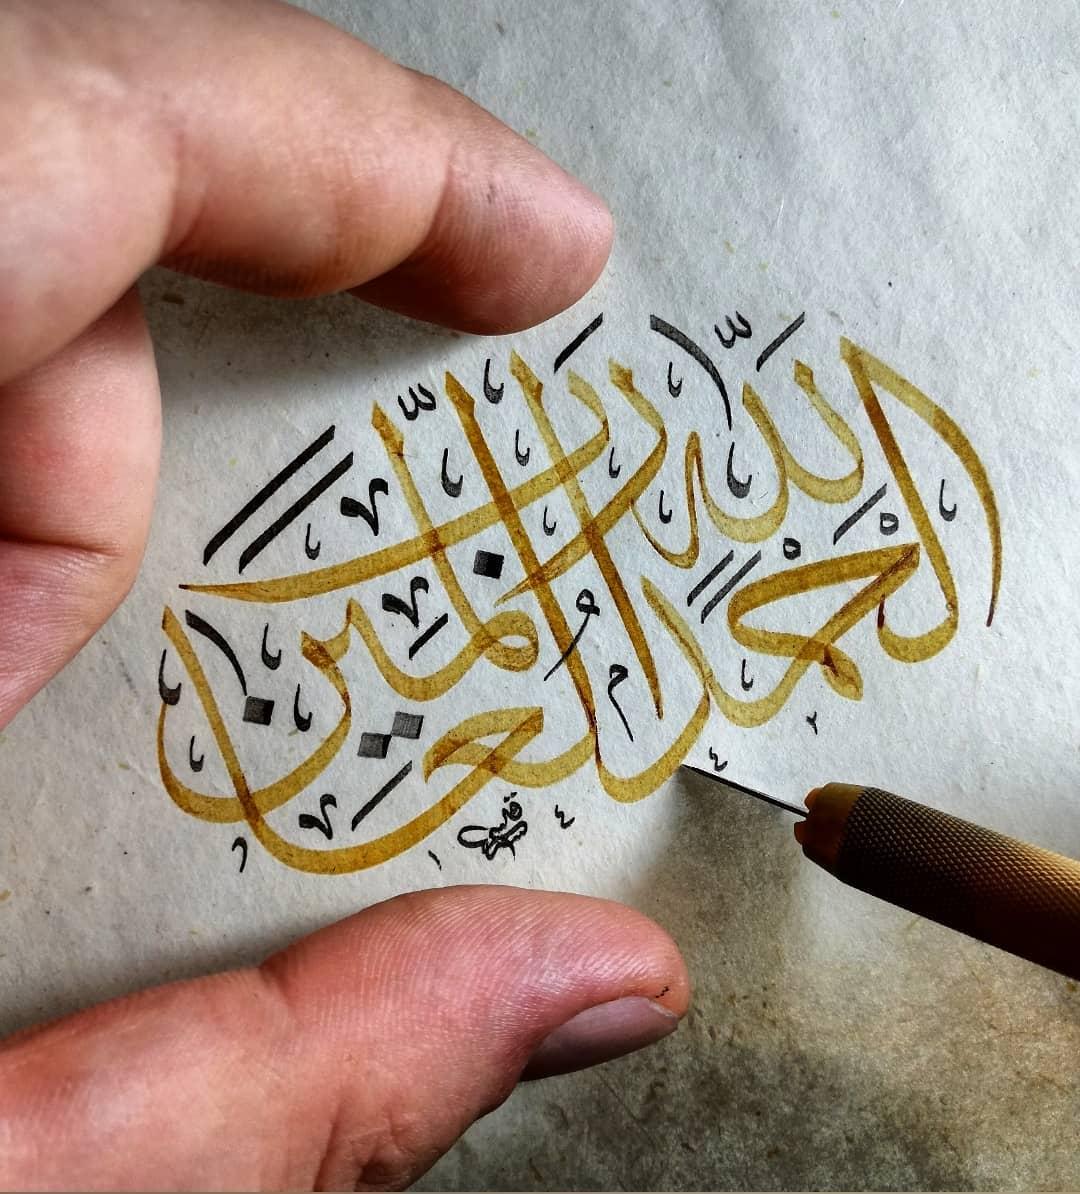 Hattat Kasım Kara قاسم قاره  Küçük istif serisi 1. 2mm. Hamd, âlemlerin Rabbi Olan Allah'a mahsustur. Praise … 1273